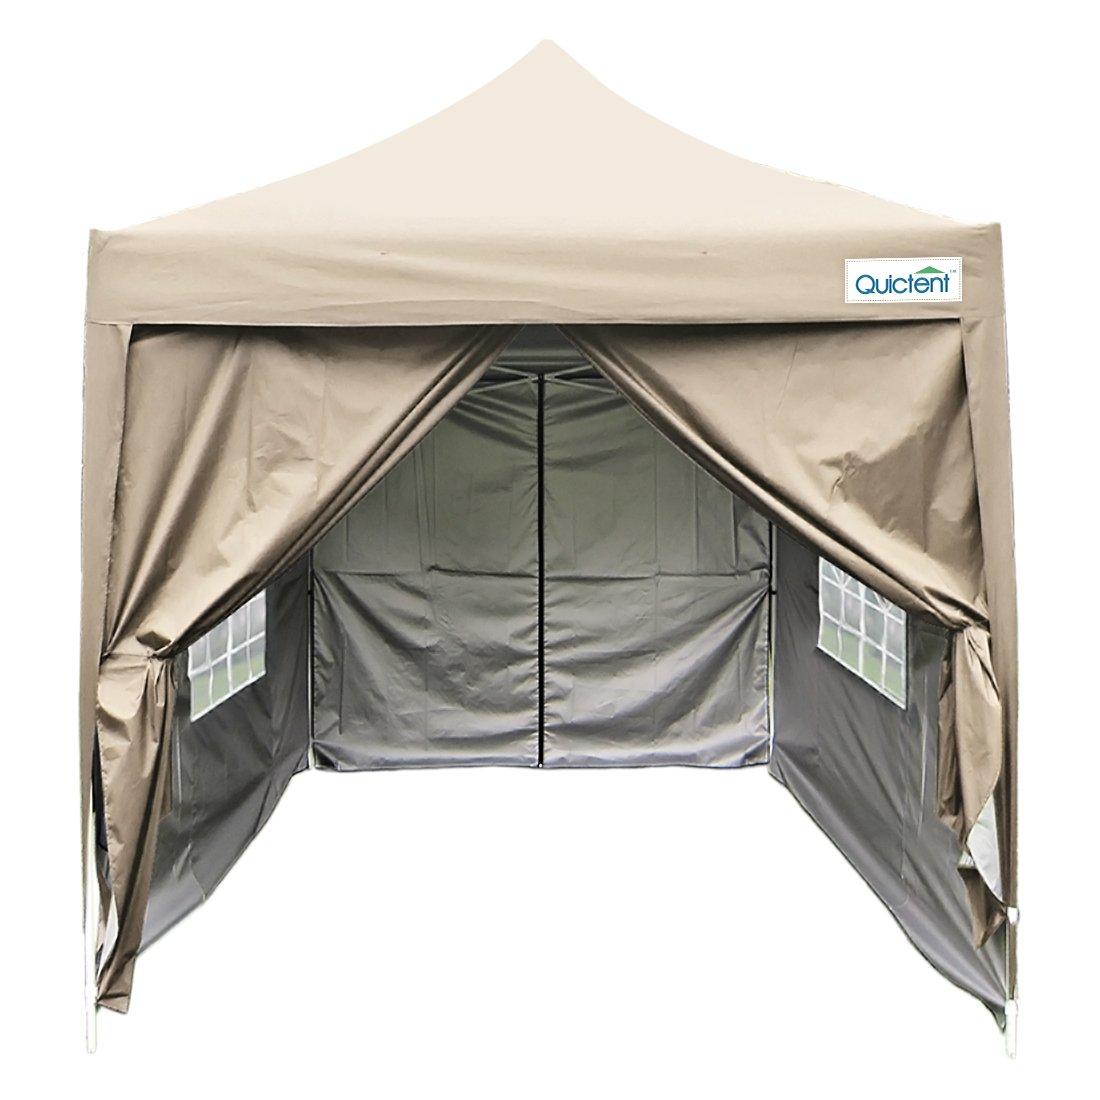 Quictent Silvox 6.6' X 6.6' Ez Set Pop up Gazebo Party Wedding Tent Canopy Marquee +4 Sidewalls +carry Bag 4 colors Waterproof (Beige)